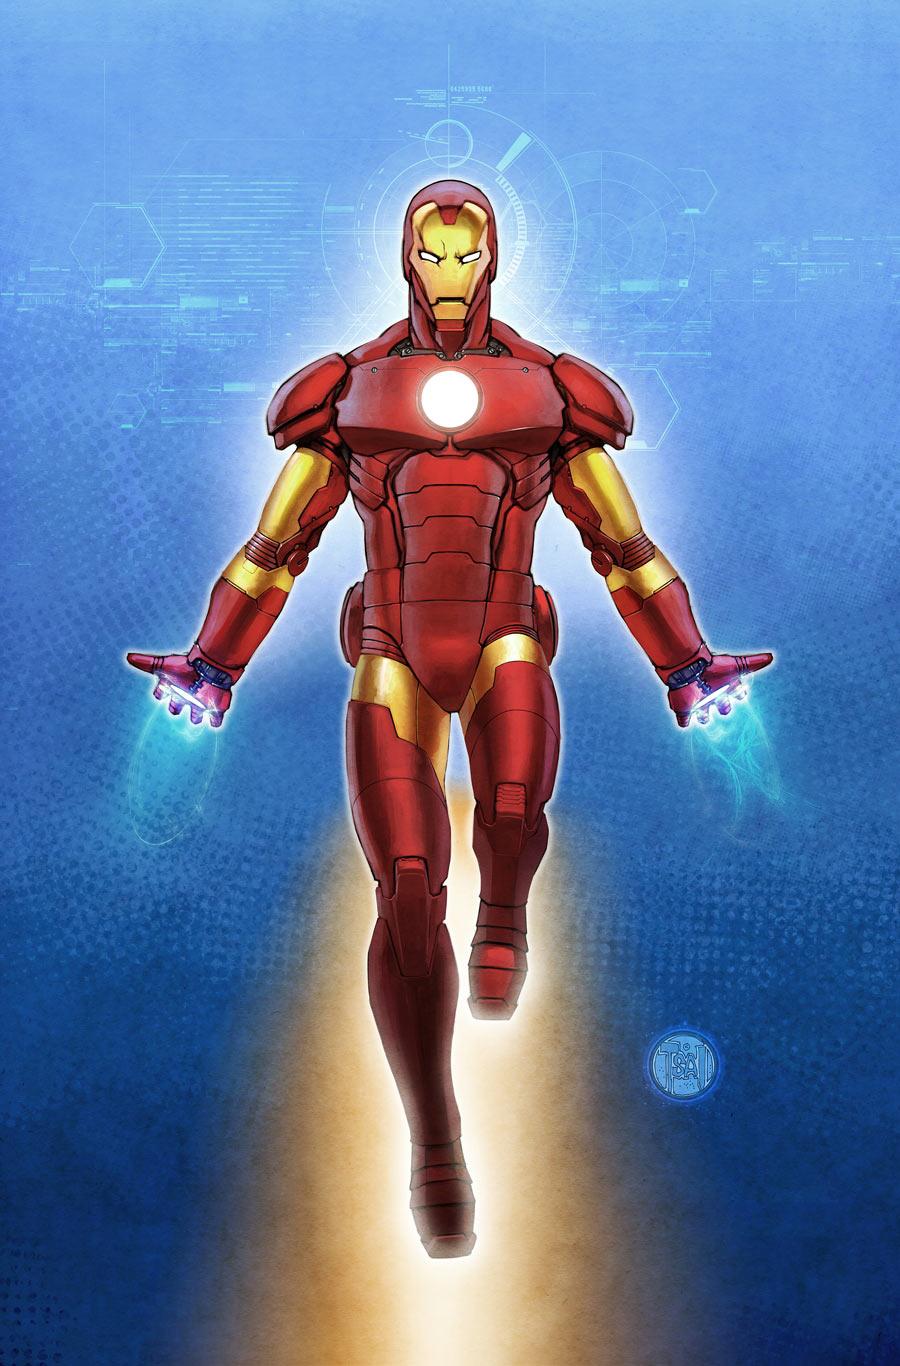 Uncategorized Iron Man Flying iron man flying up qonyz apparelweapons batman has up